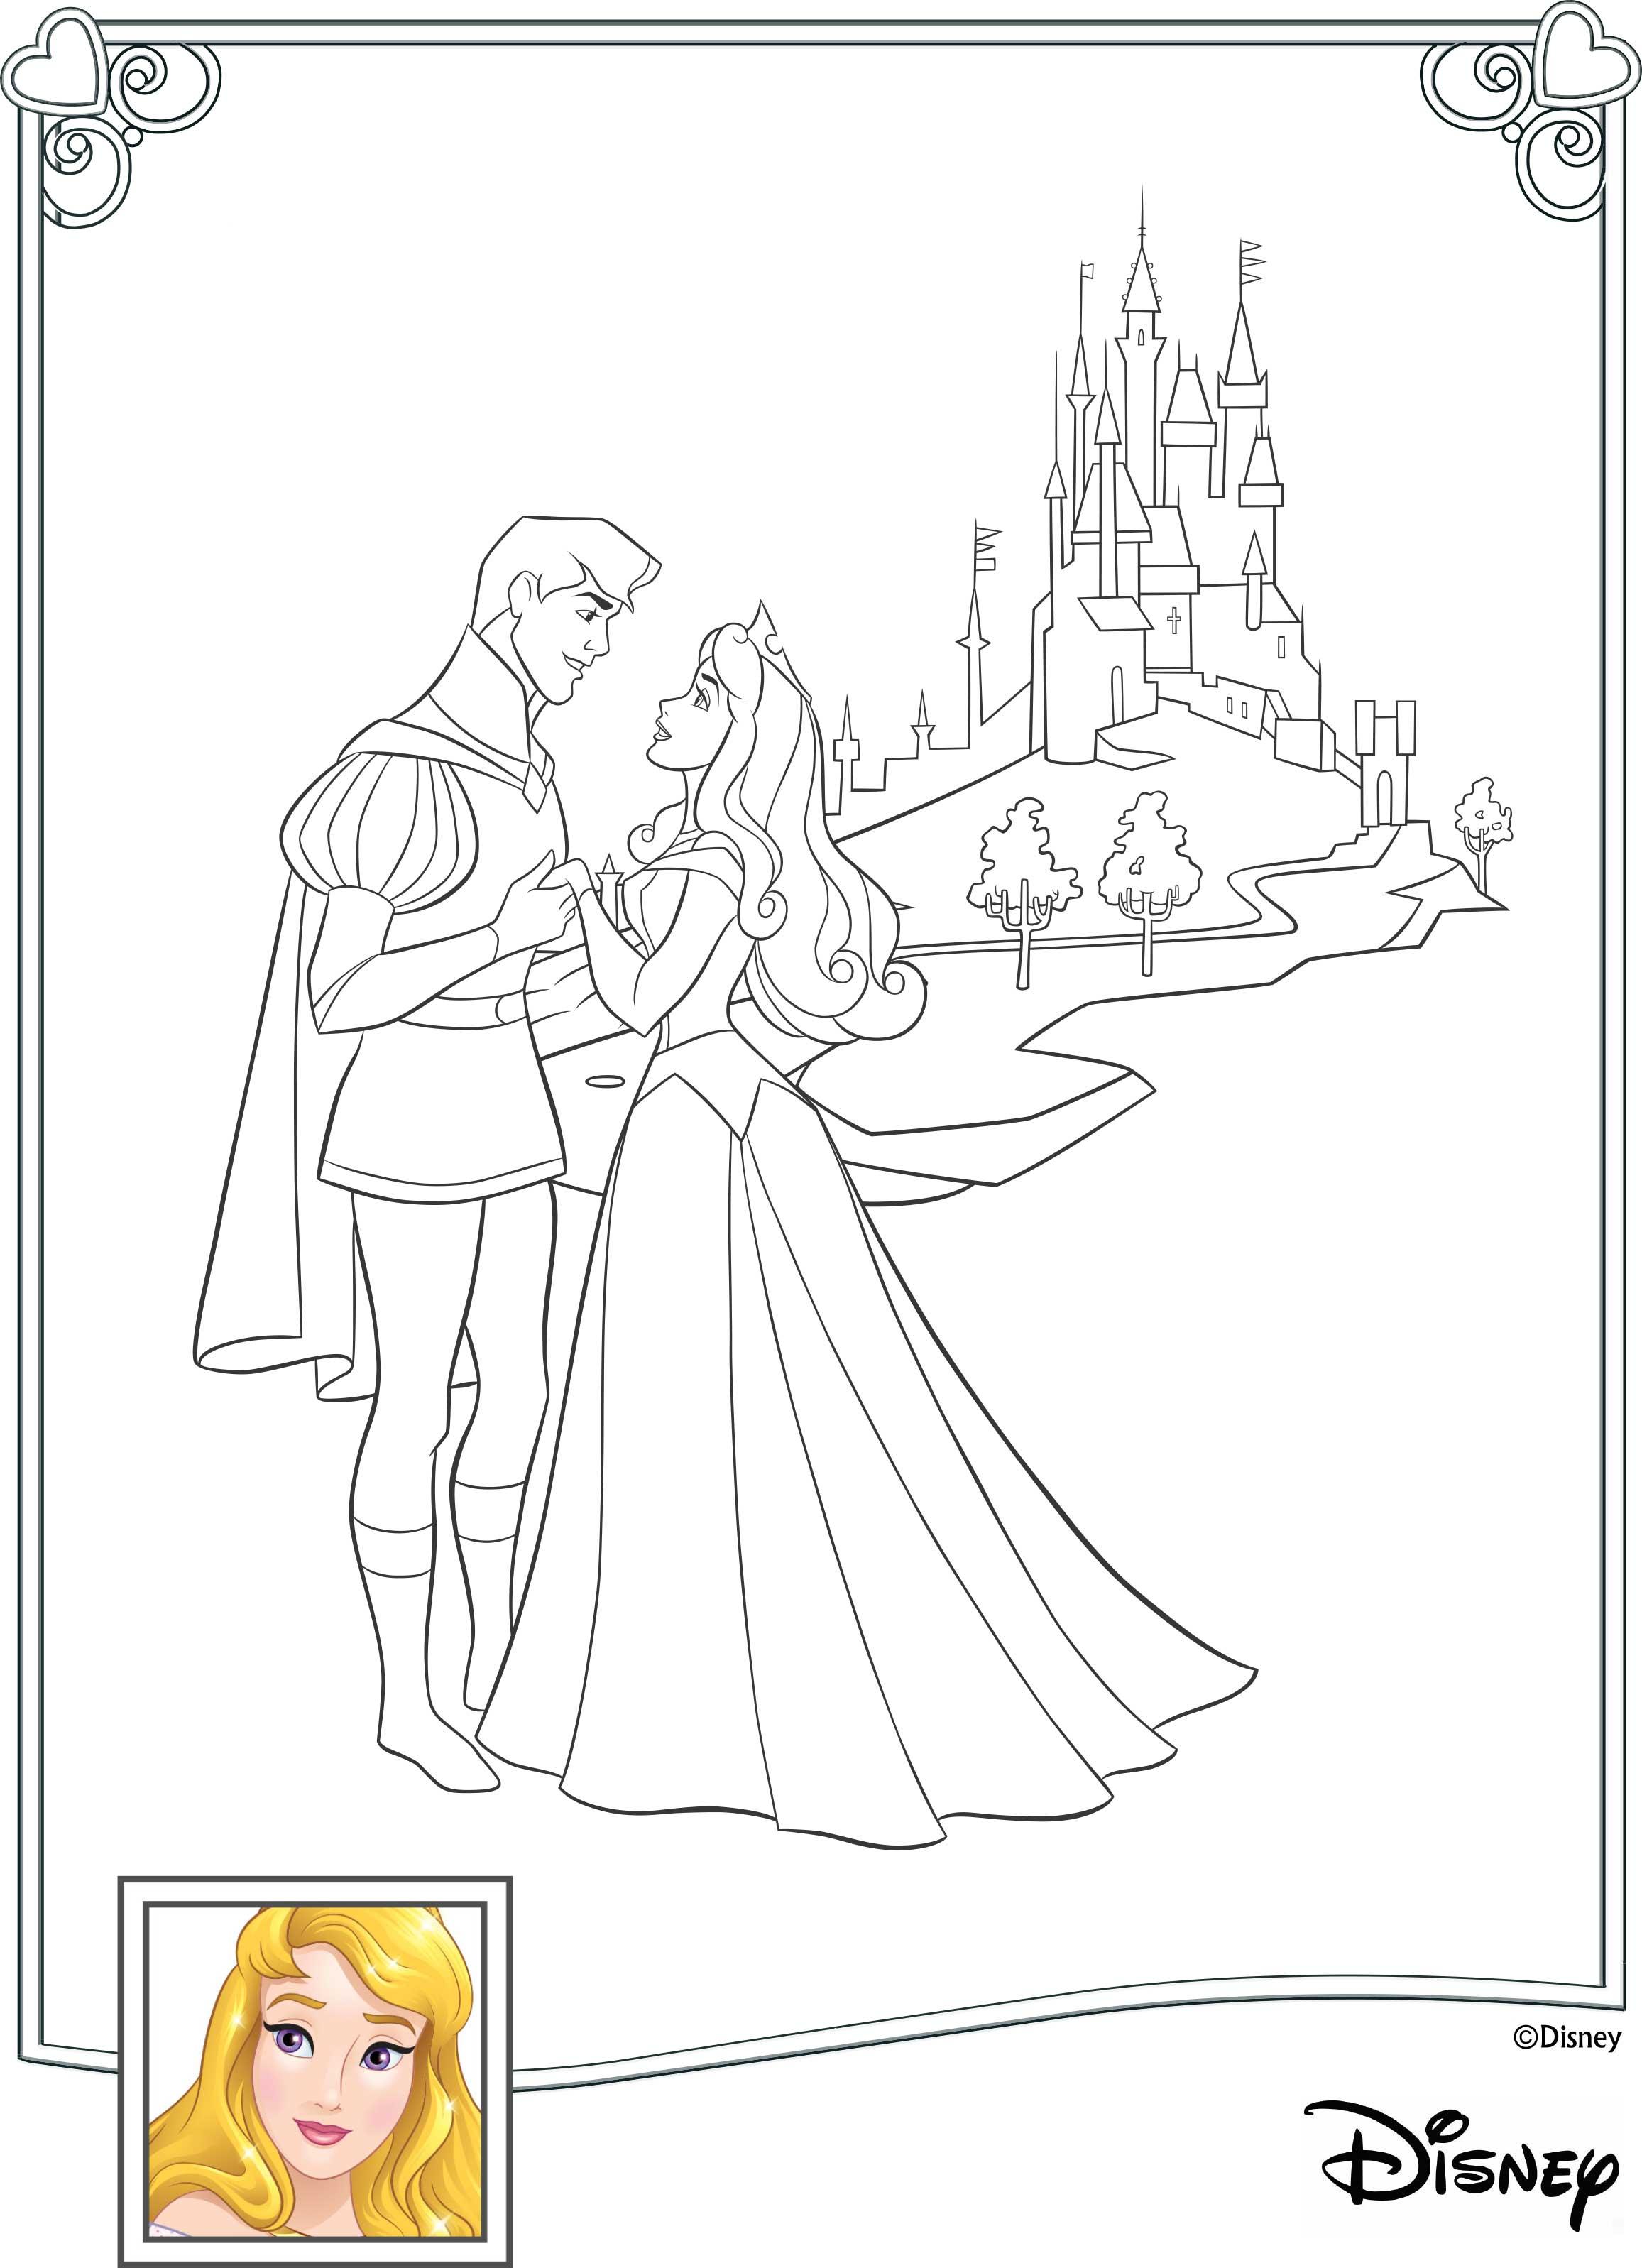 disney princess interactive coloring pages - photo#2